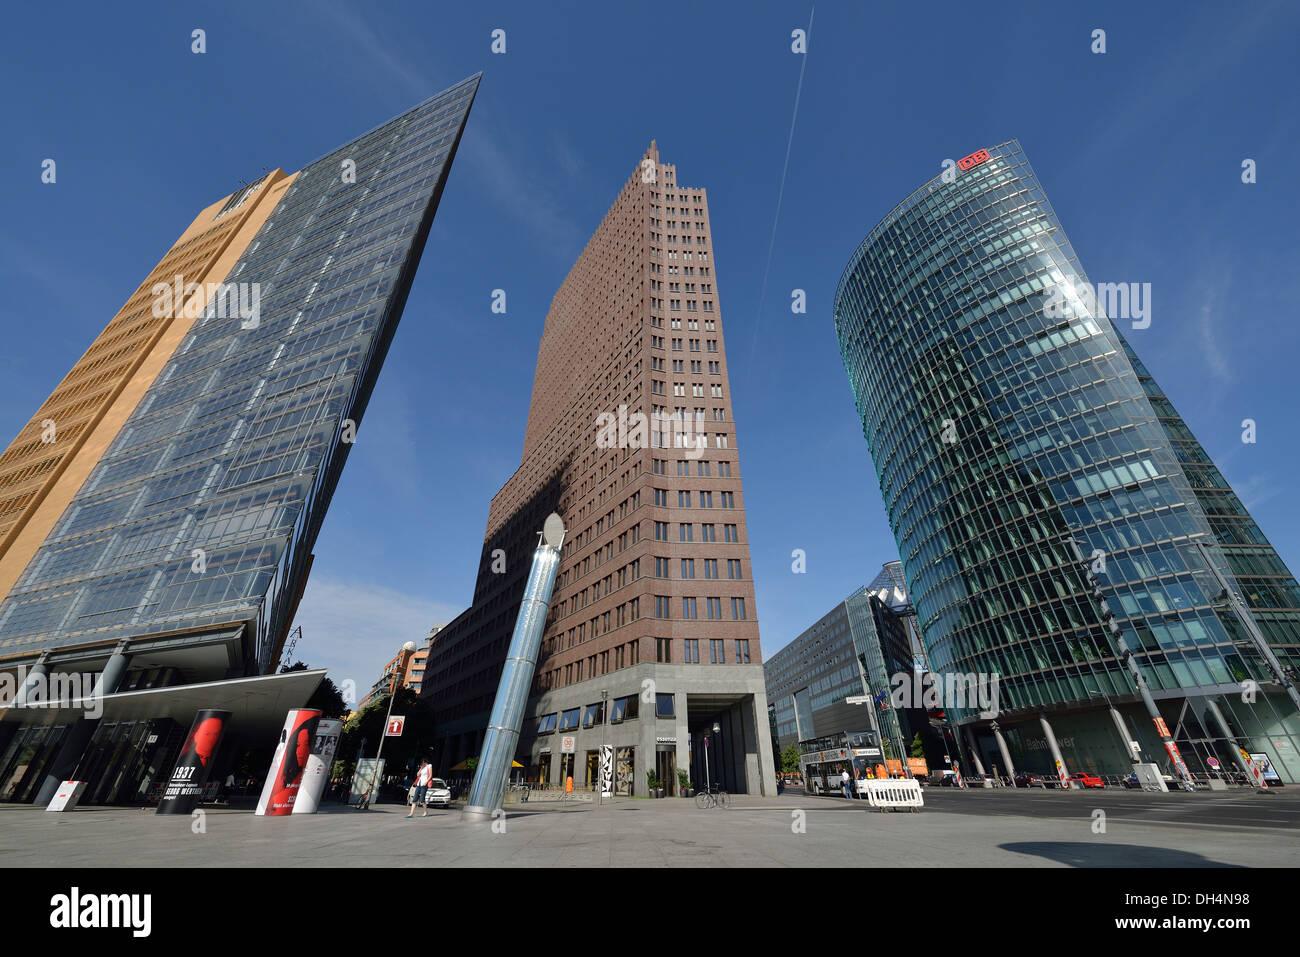 Berlino. Germania. Potsdamer Platz. L-R, Daimler Chrysler Tower, Kollhoff Tower, Bahn Tower Foto Stock